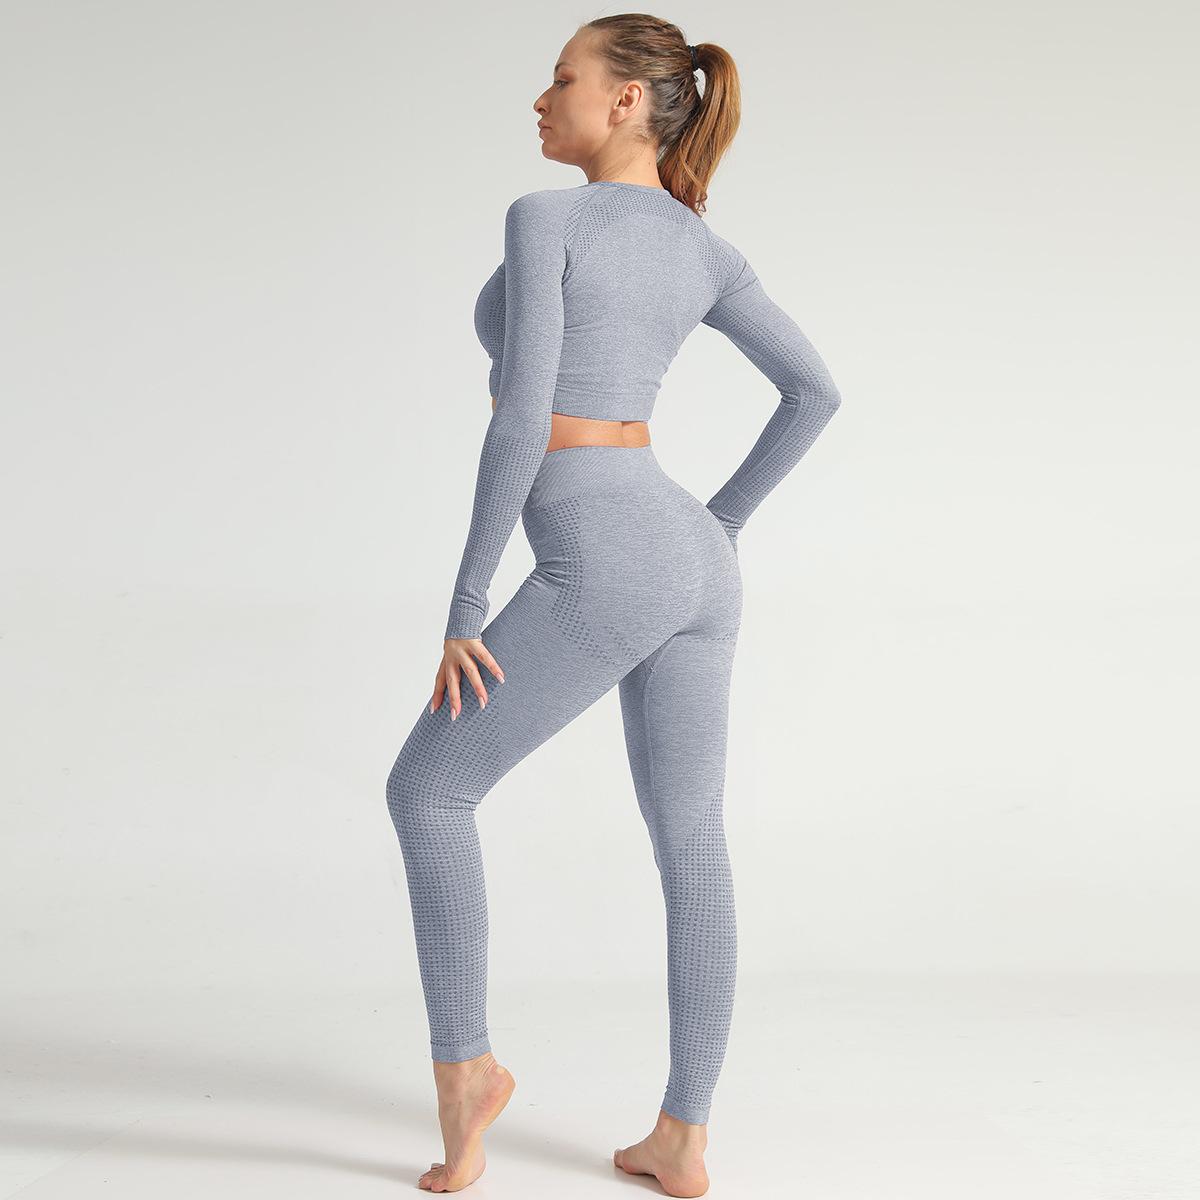 2020 Spring Summer Women Gymwear Seamless Bra Peach Butt Leggings Knitting Yoga Set 5